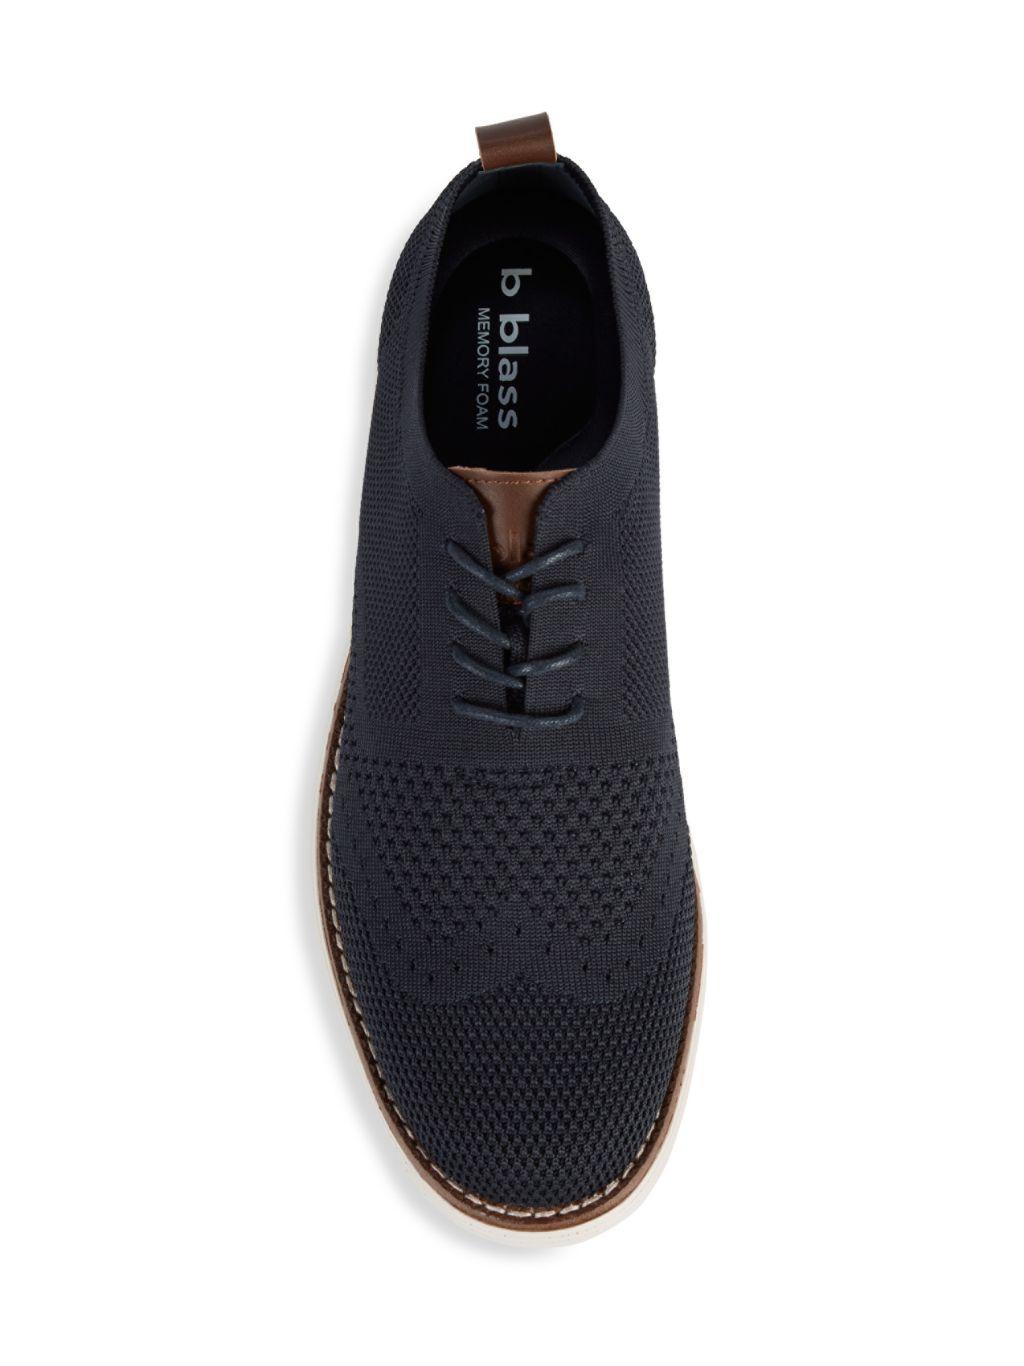 Bill Blass Knit Plain-Toe Balmoral Shoes